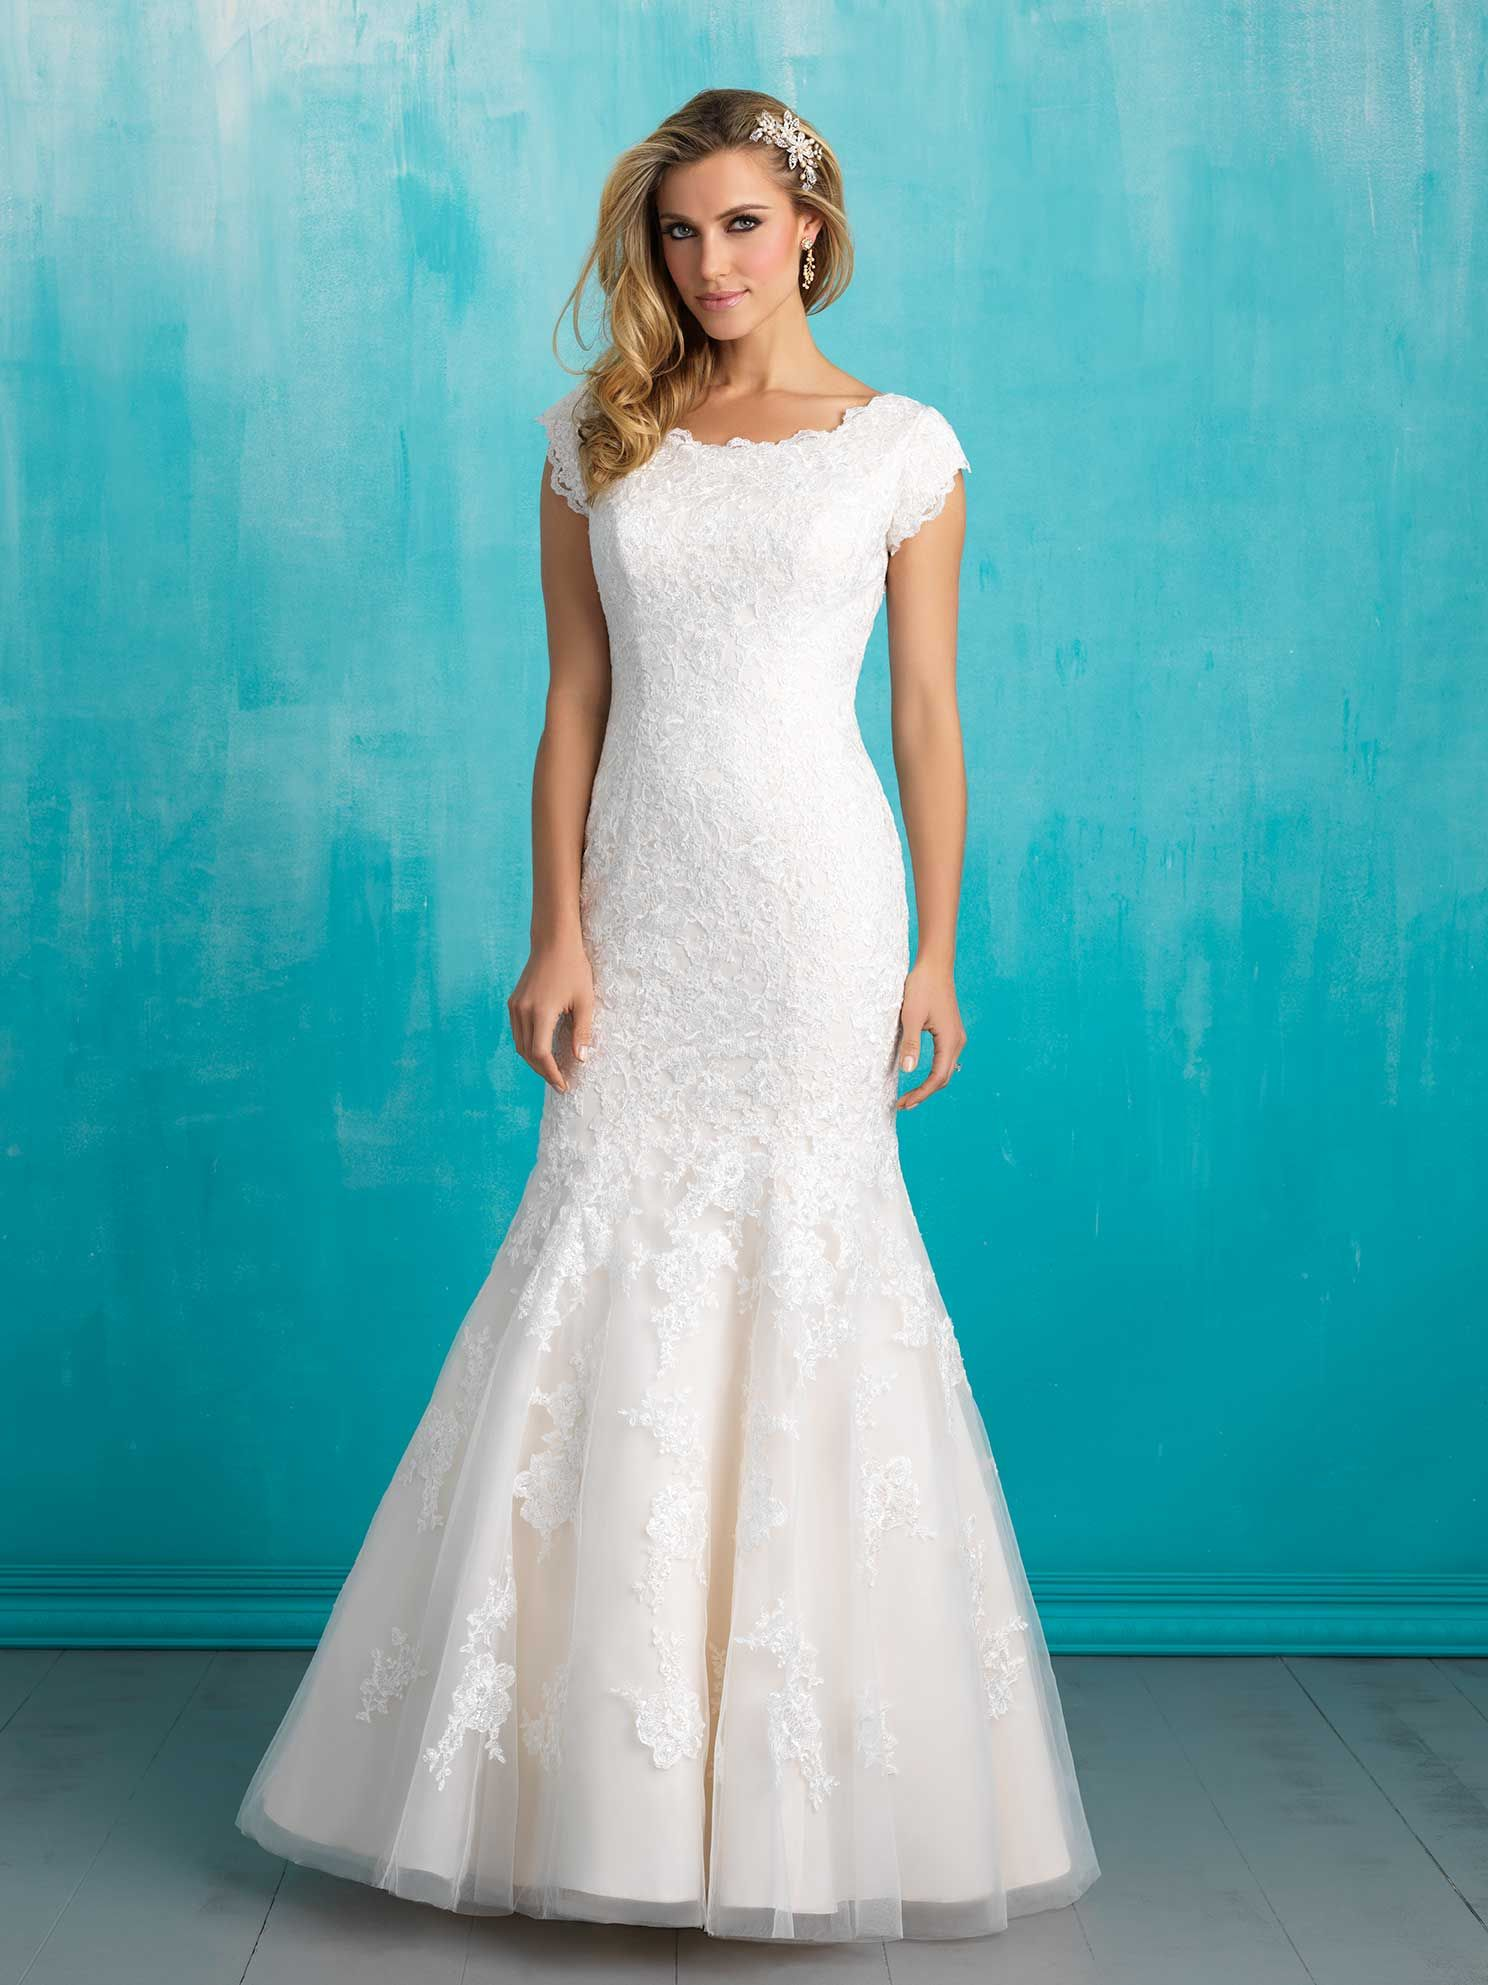 Style: M555 | Lace wedding dresses, Lace wedding and Wedding dress